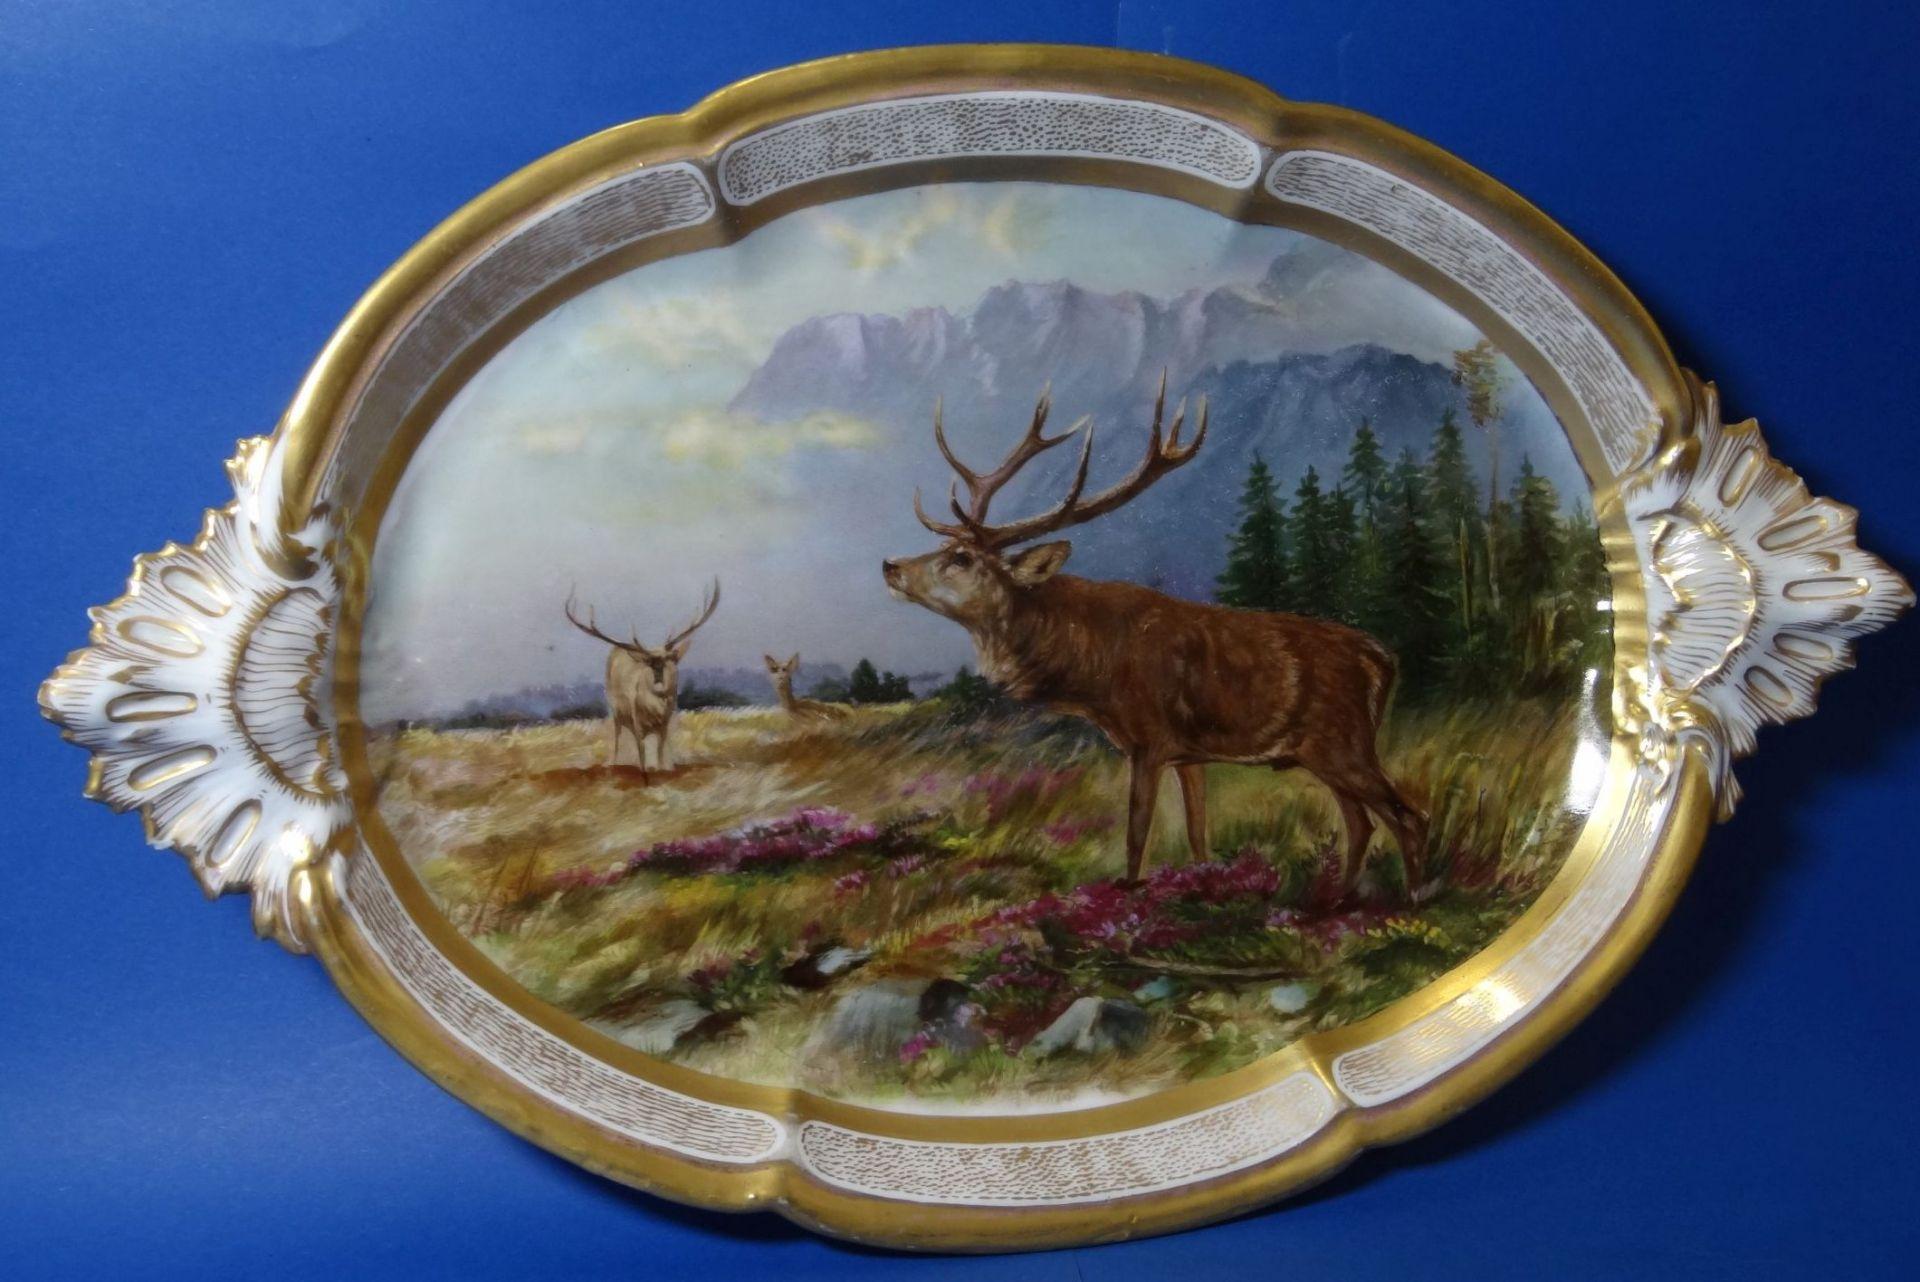 gr. ovale Platte, mit Hirsch-Gruppe,Goldstaffage, L-41 cm, B-27 cm